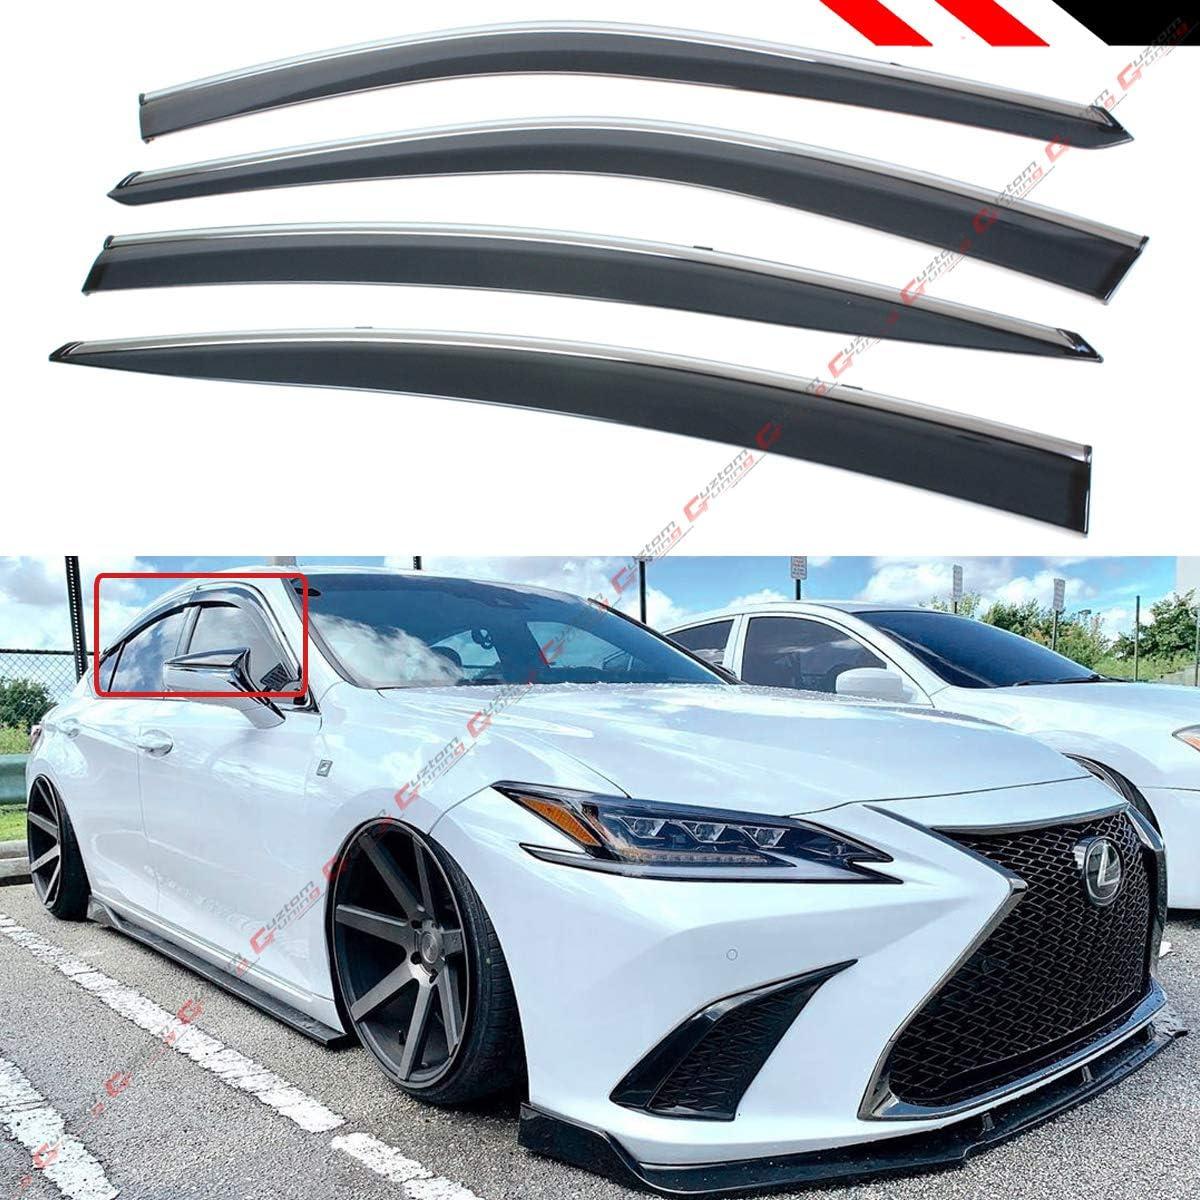 Set of 2 Custom Fit Automotive Reflective Front Seat Side Window Sunshade for 2019 Lexus ES350 ES300H Sedan